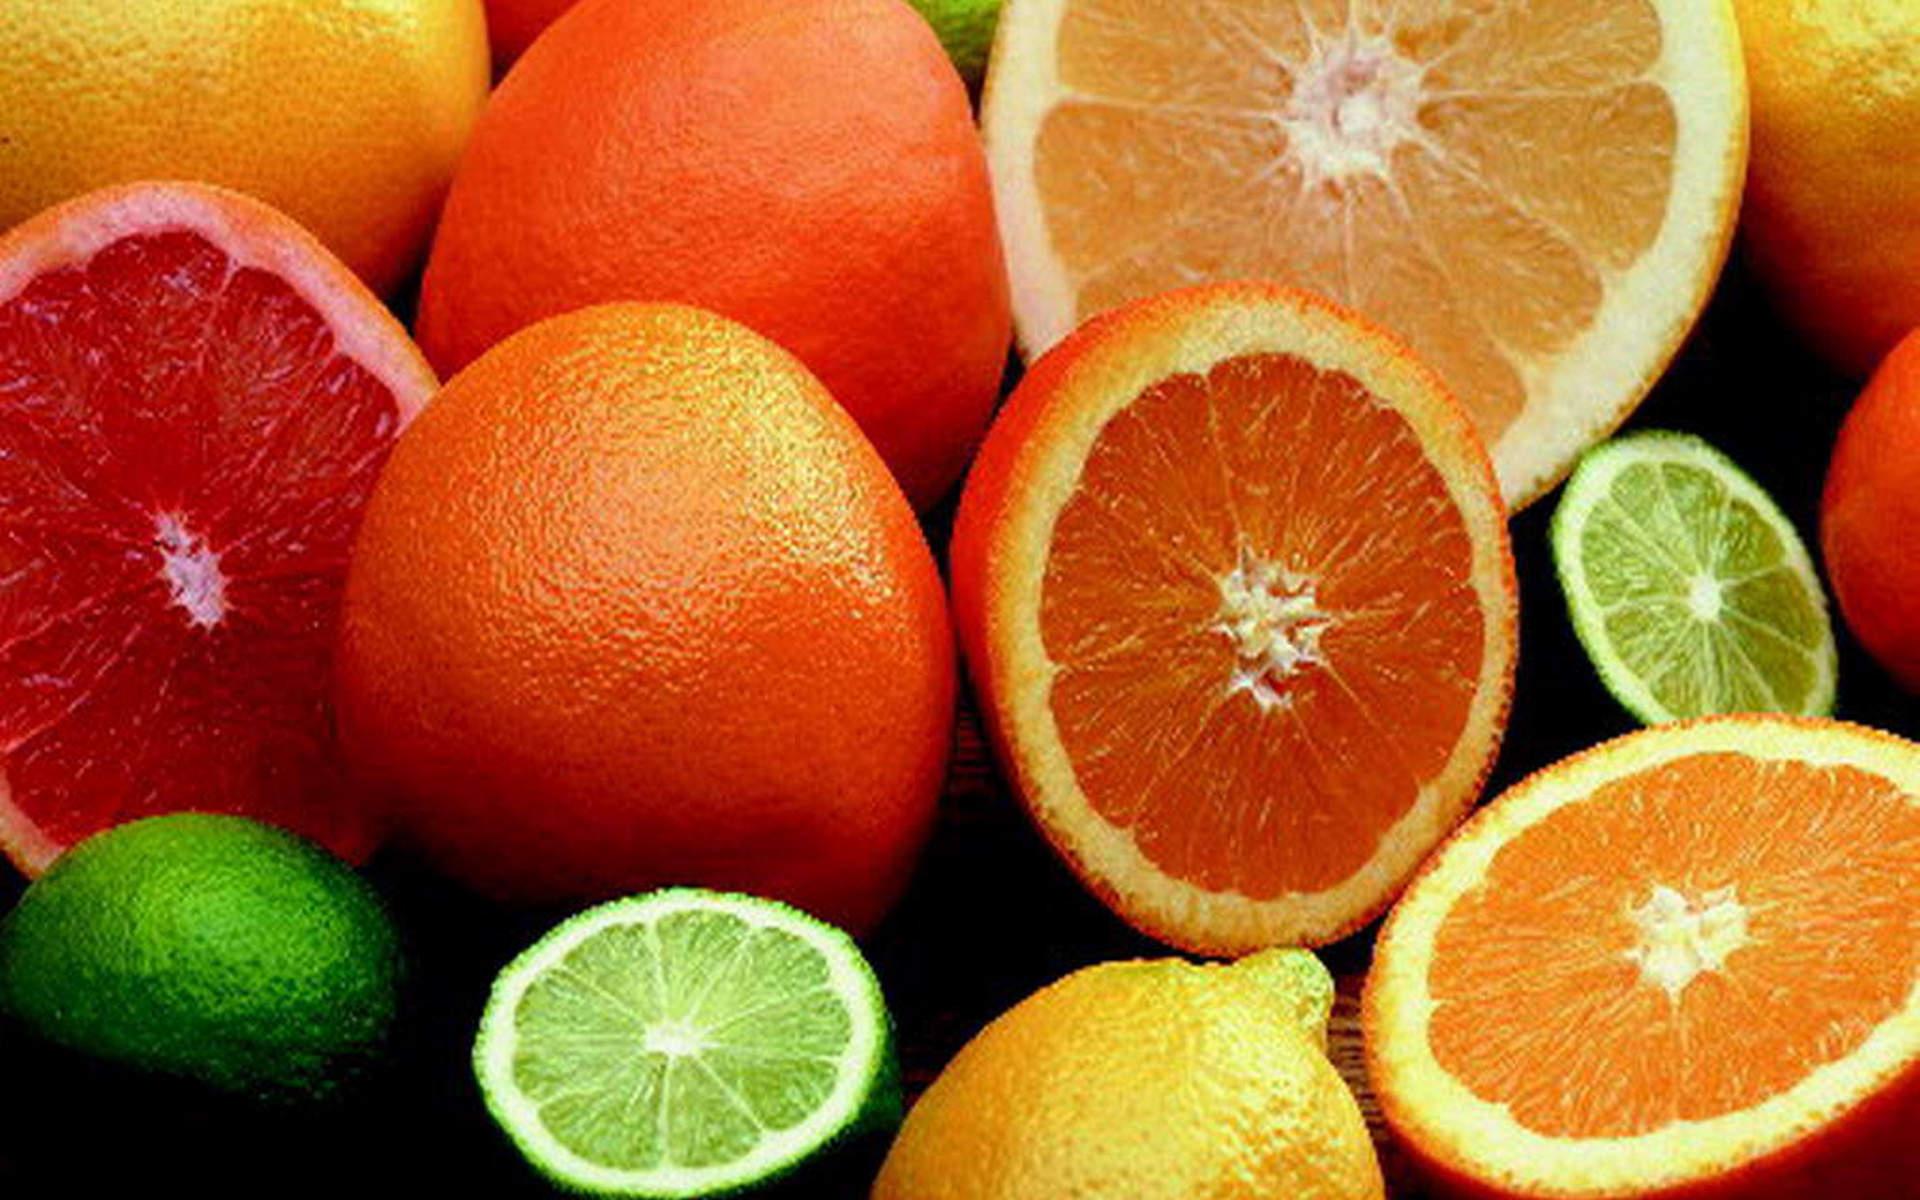 апельсины, лимоны, лайм